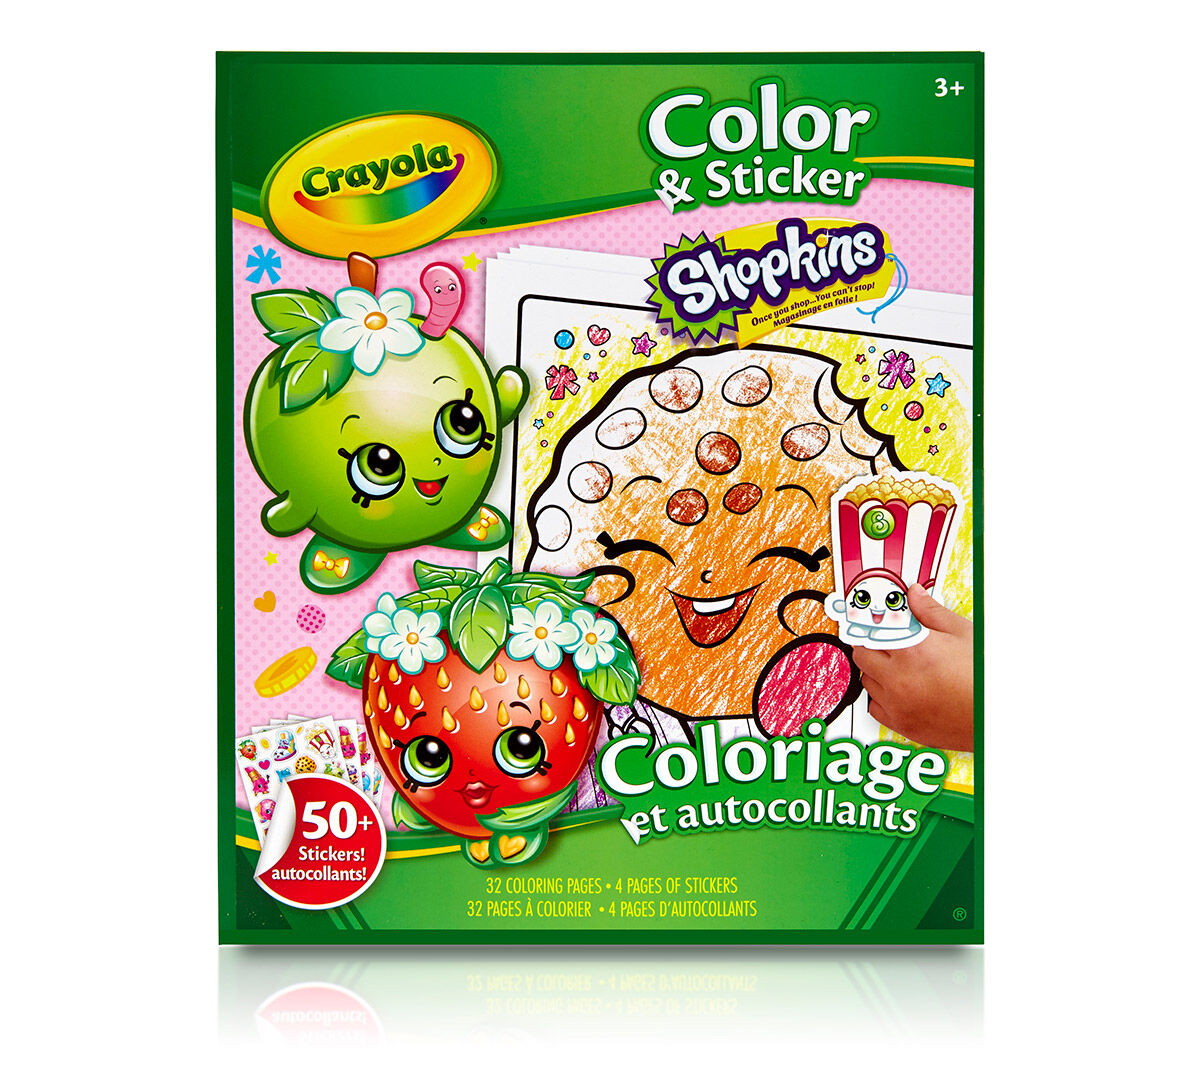 Crayola Color & Sticker, Shopkins, Art Activity, Great For Travel Crayola